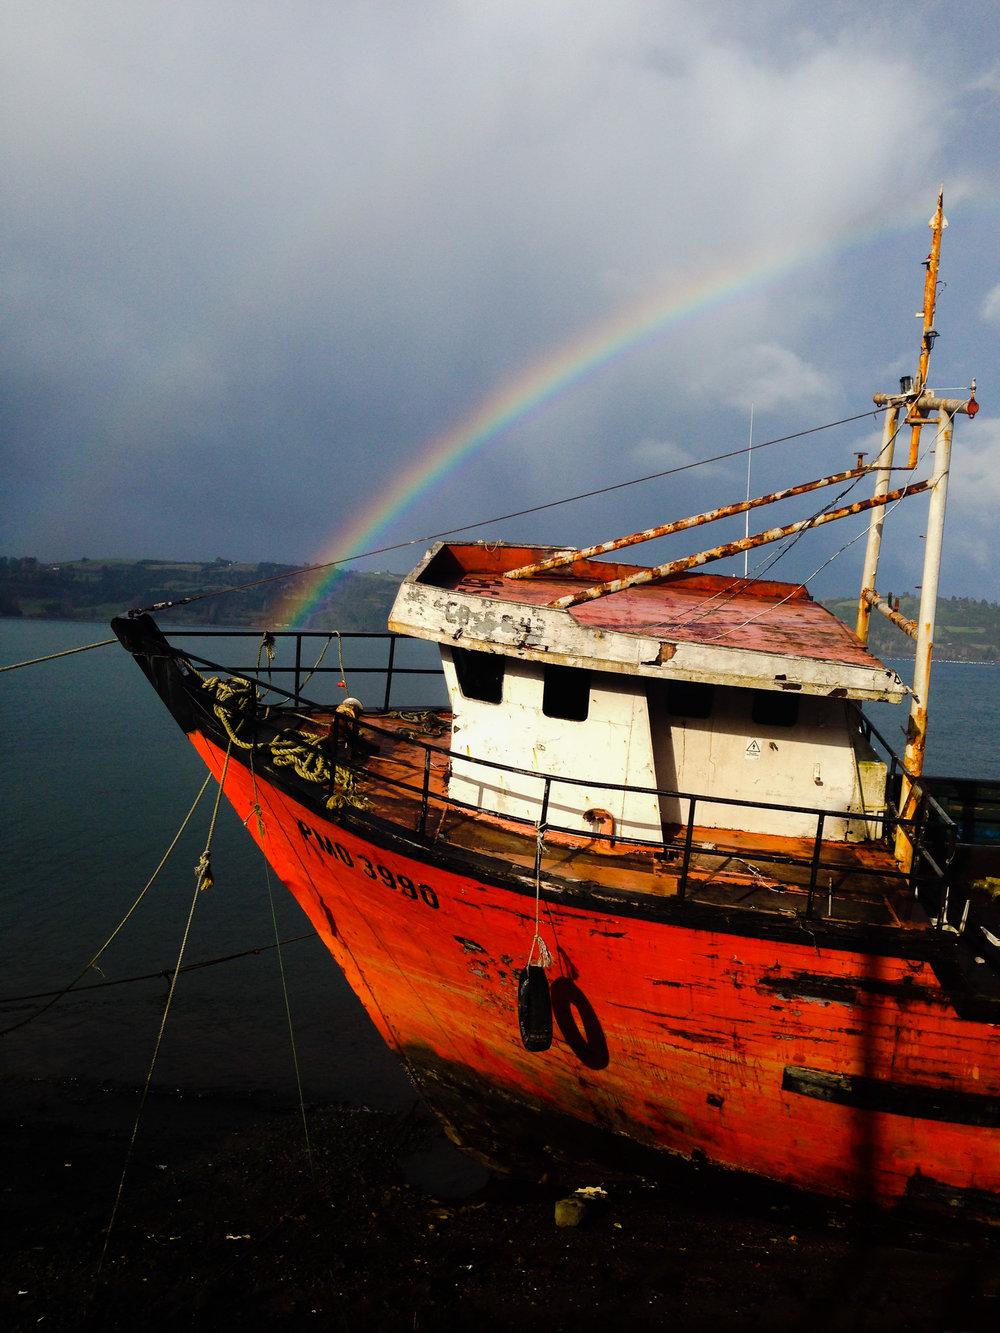 Homeostasis: ISLA Chiloe, Chile